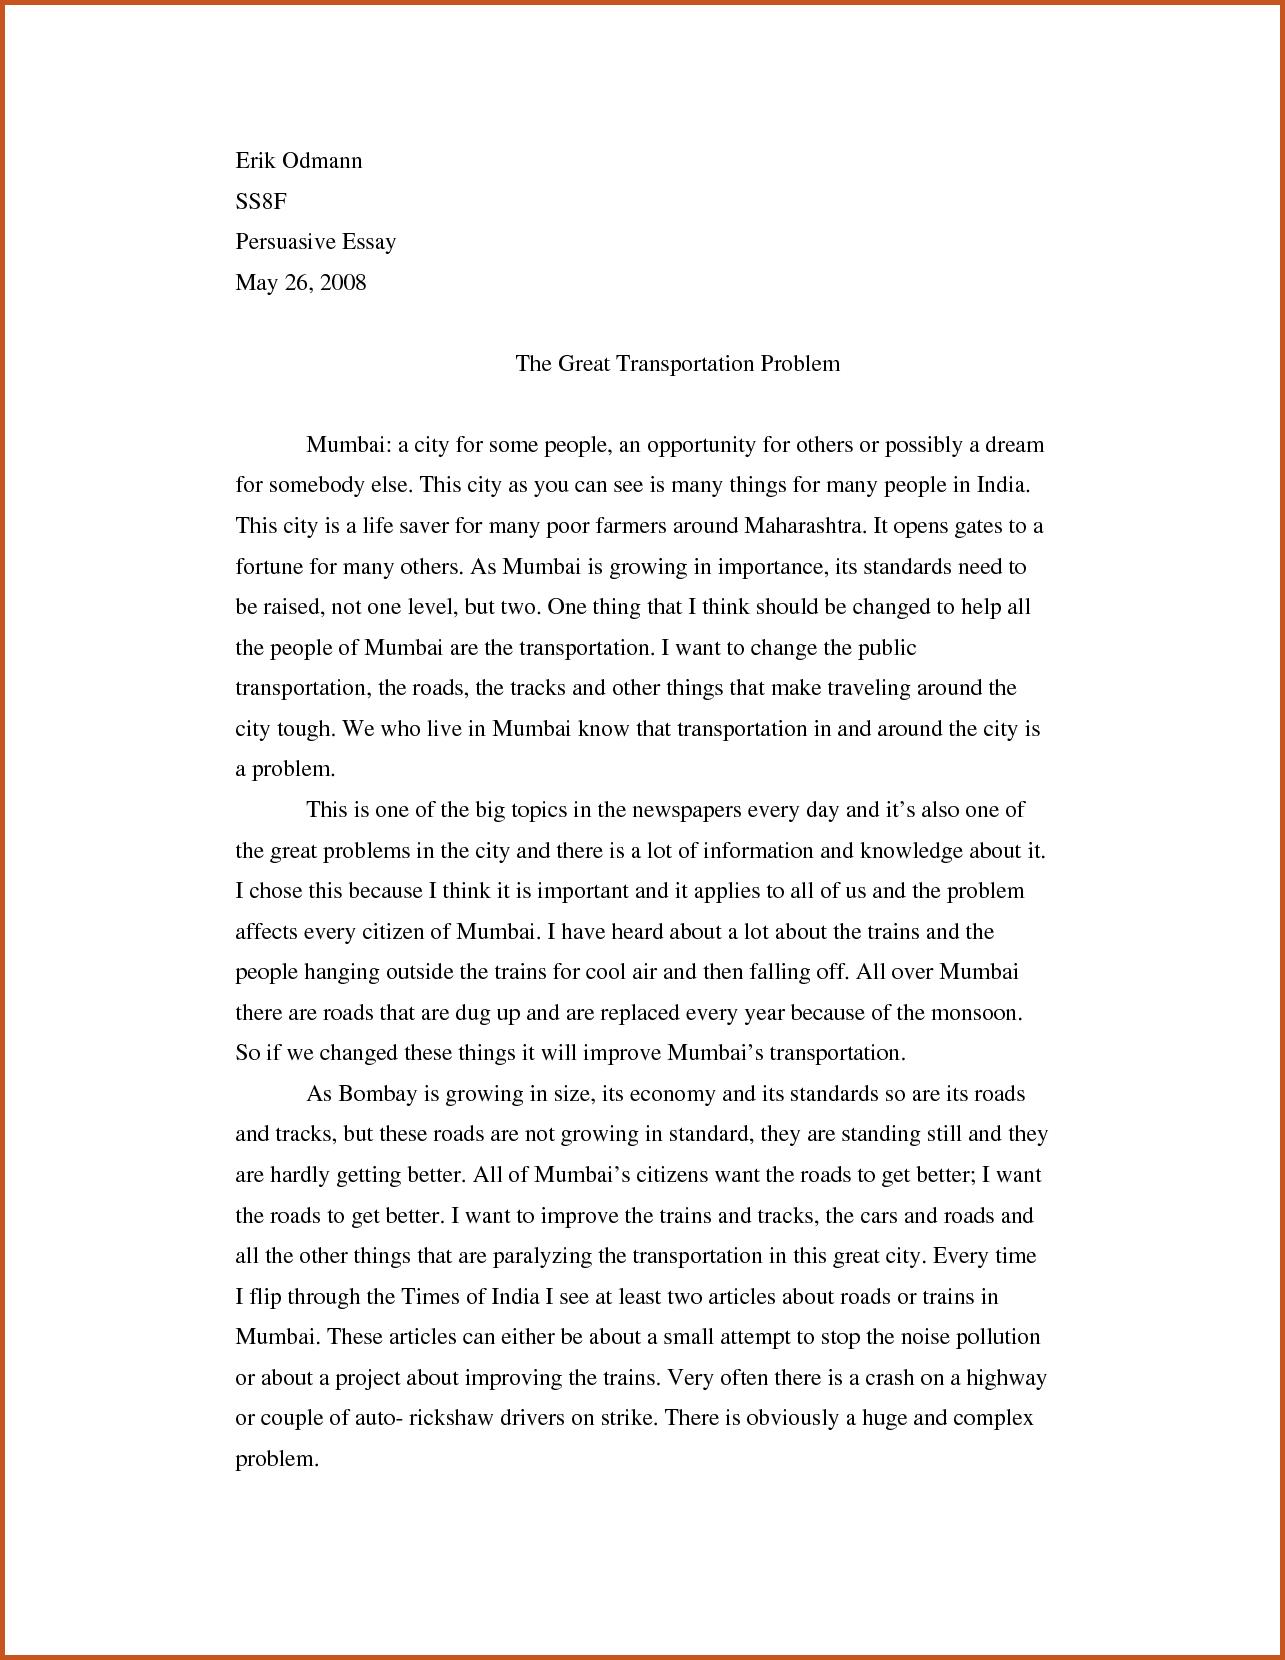 006 Counter Argument Essay Example Sop Examples Persuasive 1 Beautiful Sample Full